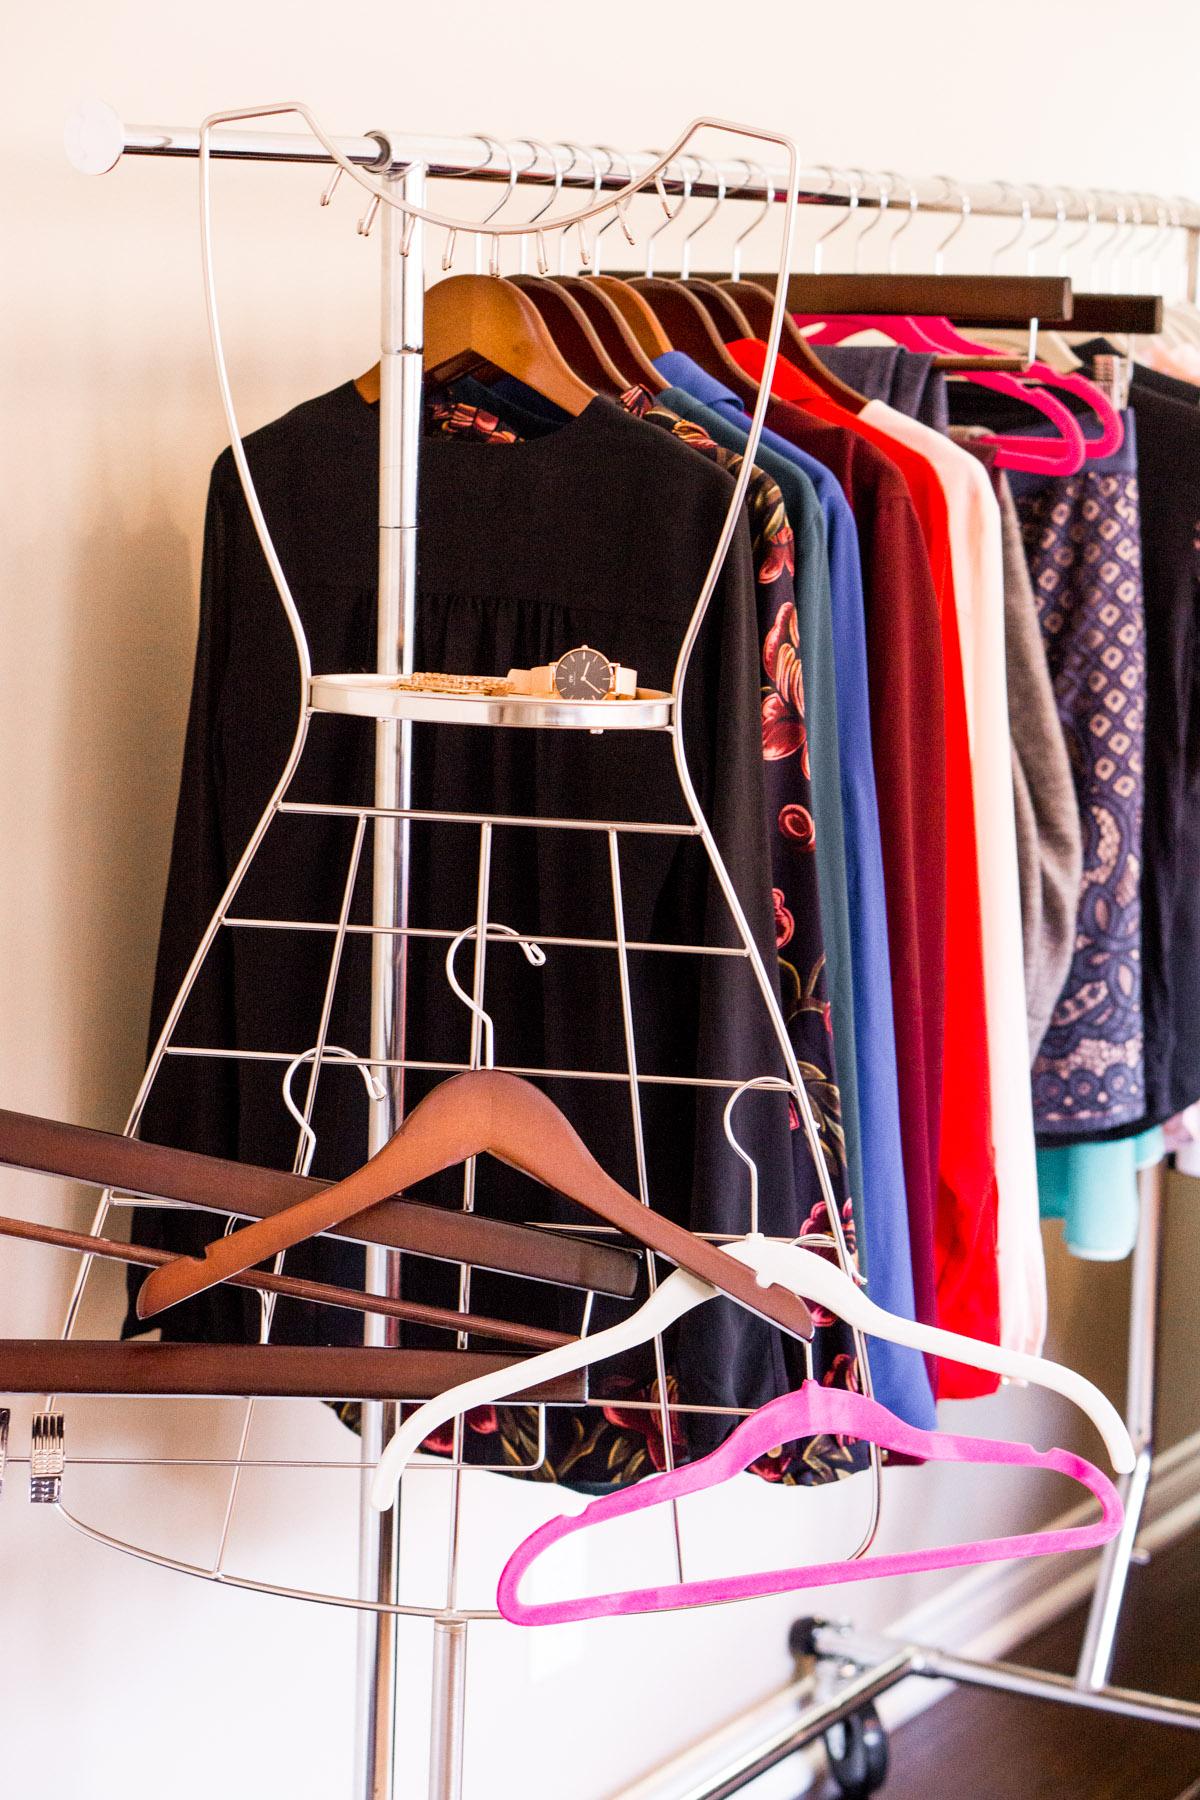 Best petite hangers | Only Hangers review | Best hanger company | Specialty hangers | How to organize closet | Audrey accessories organizer | Folding wardrobe garment rack | Wooden hangers | Ann Taylor | Lululemon